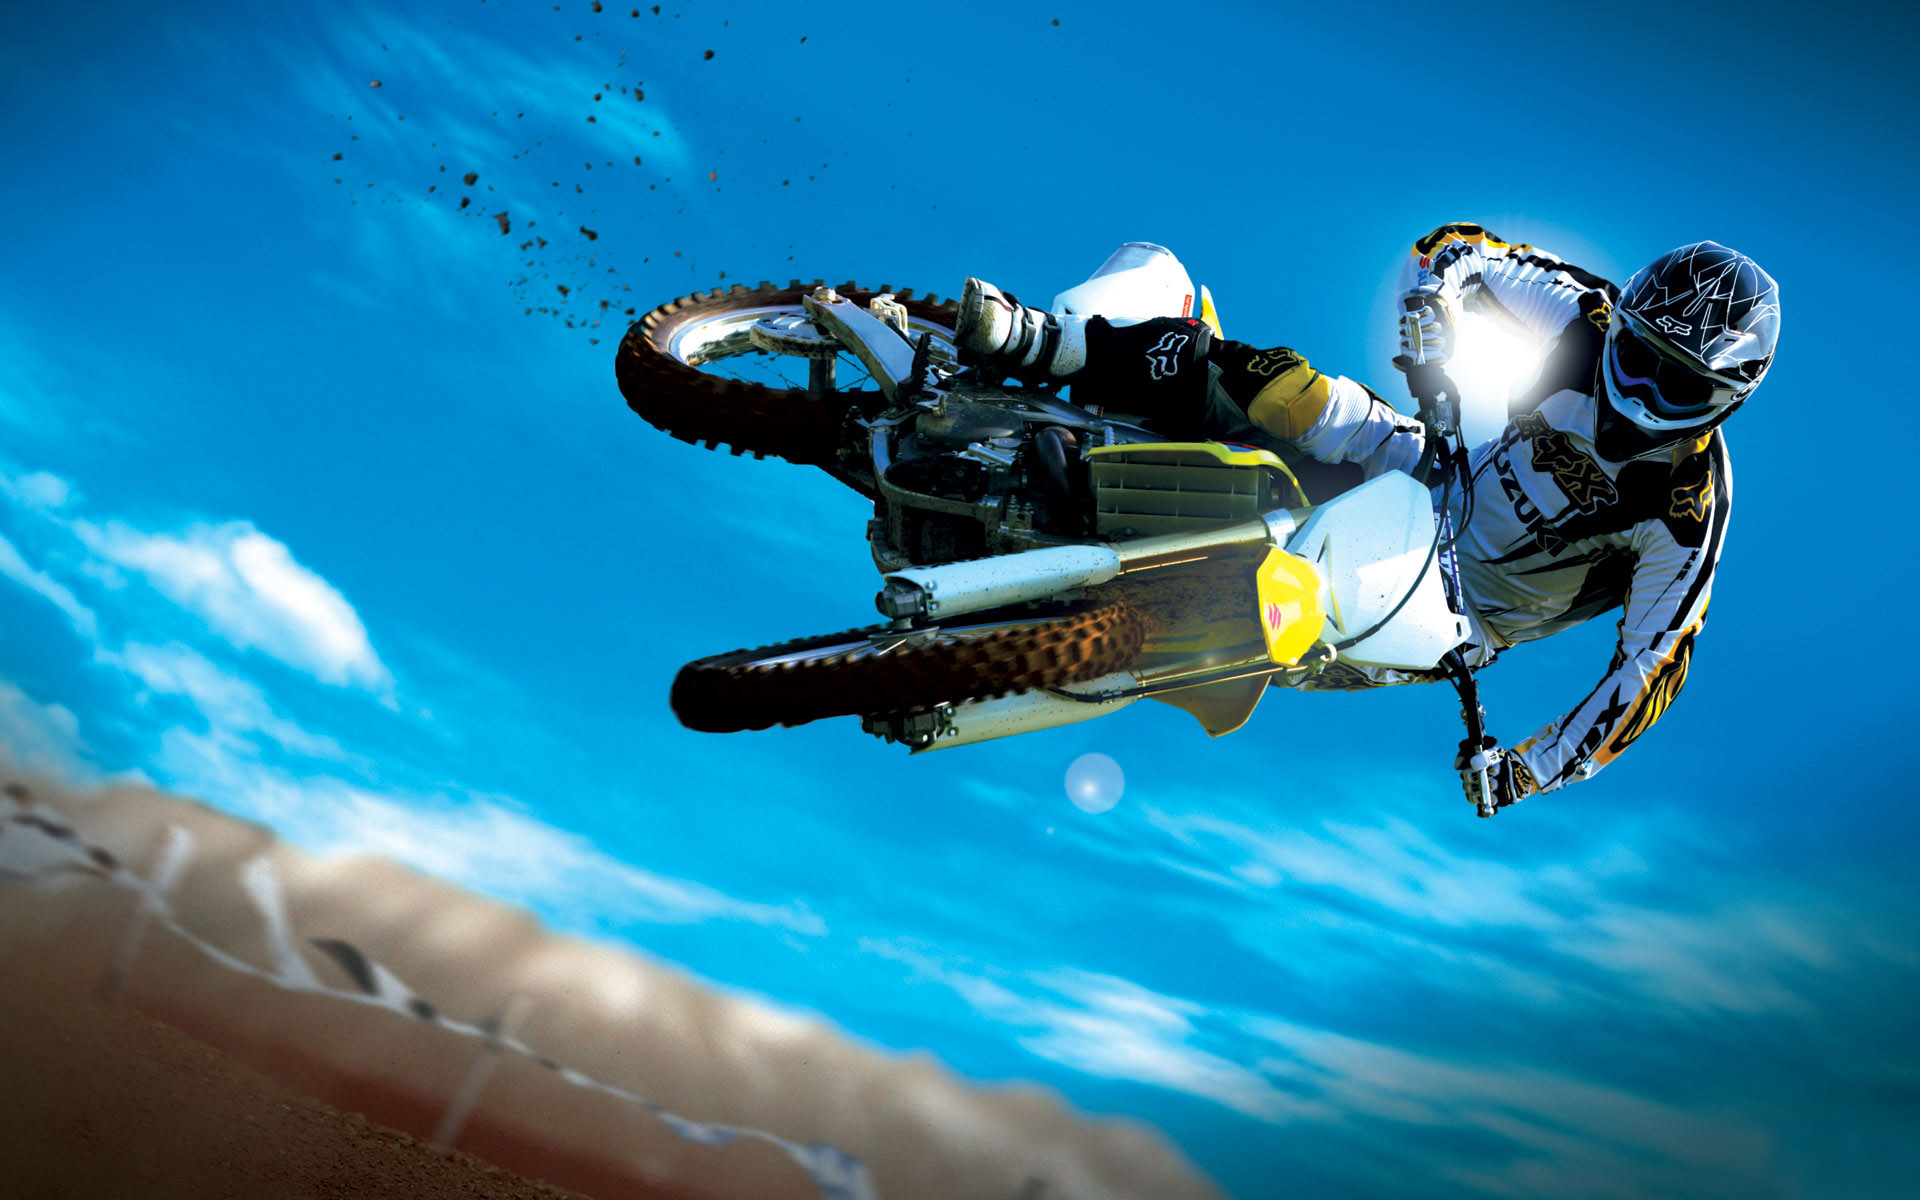 Amazing Motocross Bike Stunt Wallpapers HD Wallpapers 1920x1200